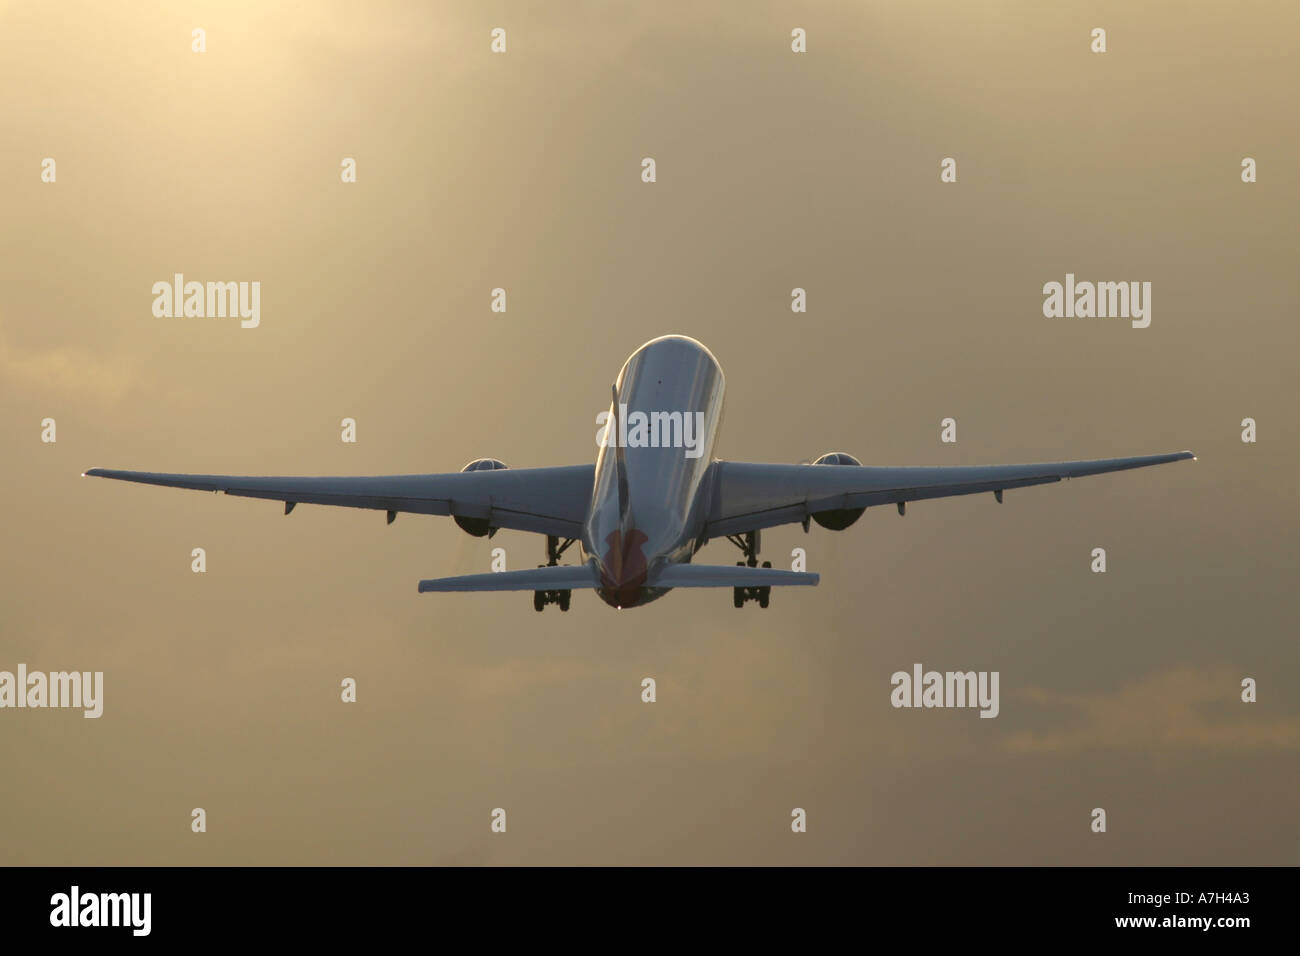 Airplane taking off - Stock Image